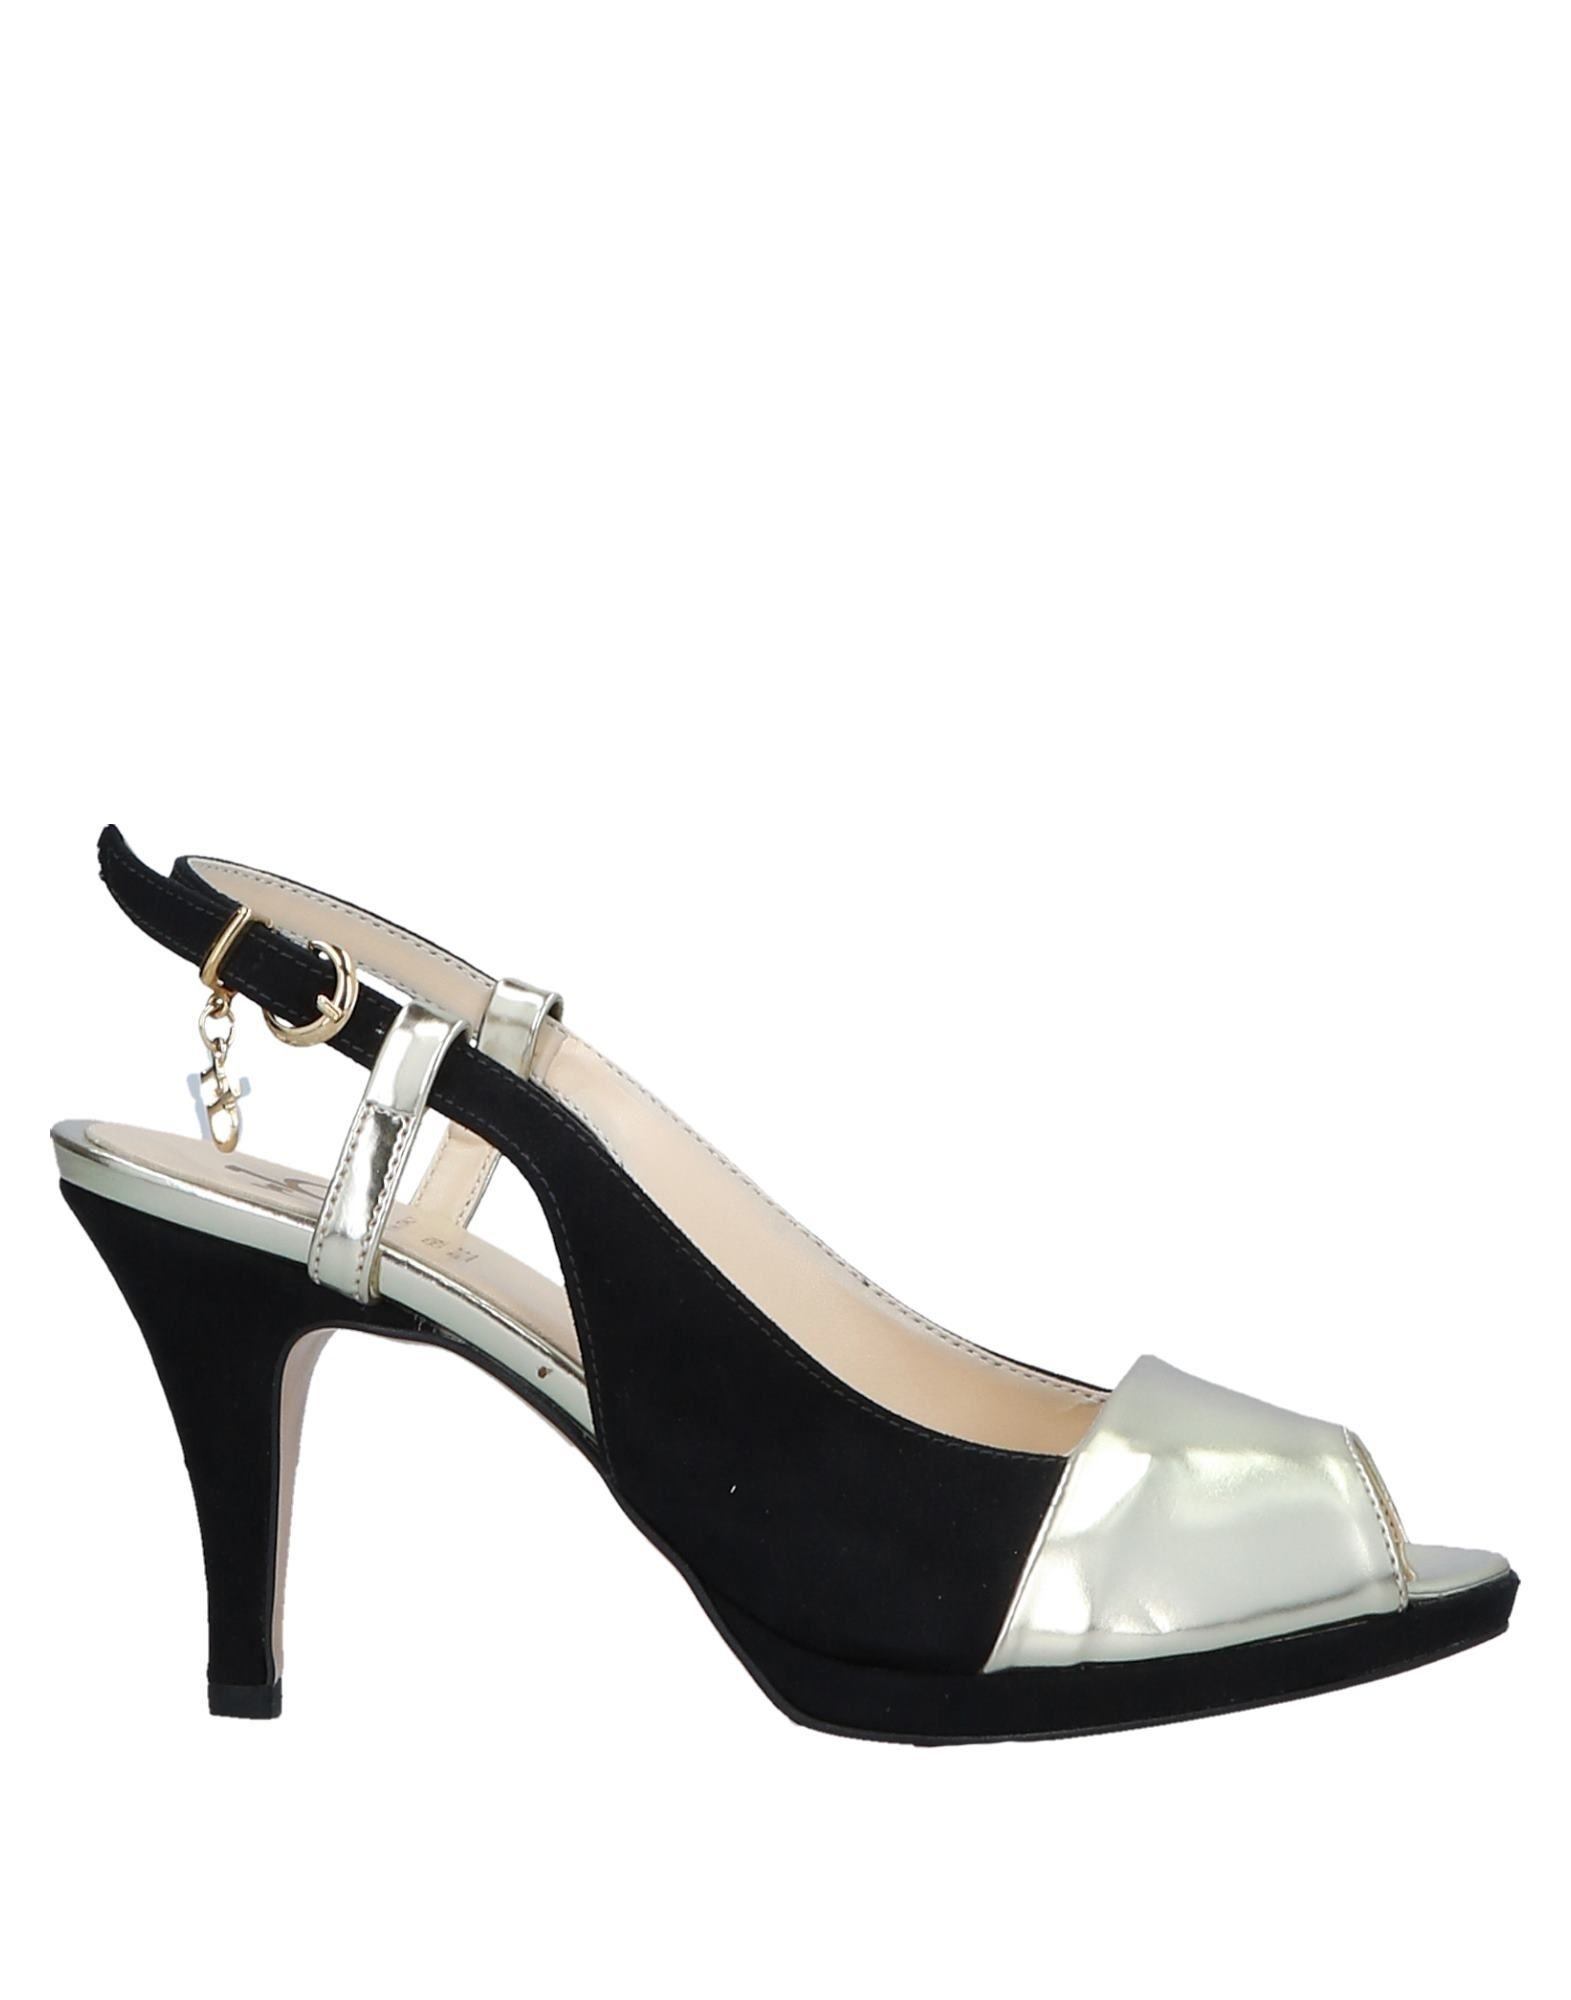 Roccobarocco Sandalen Damen  11521557DP Gute Qualität beliebte Schuhe